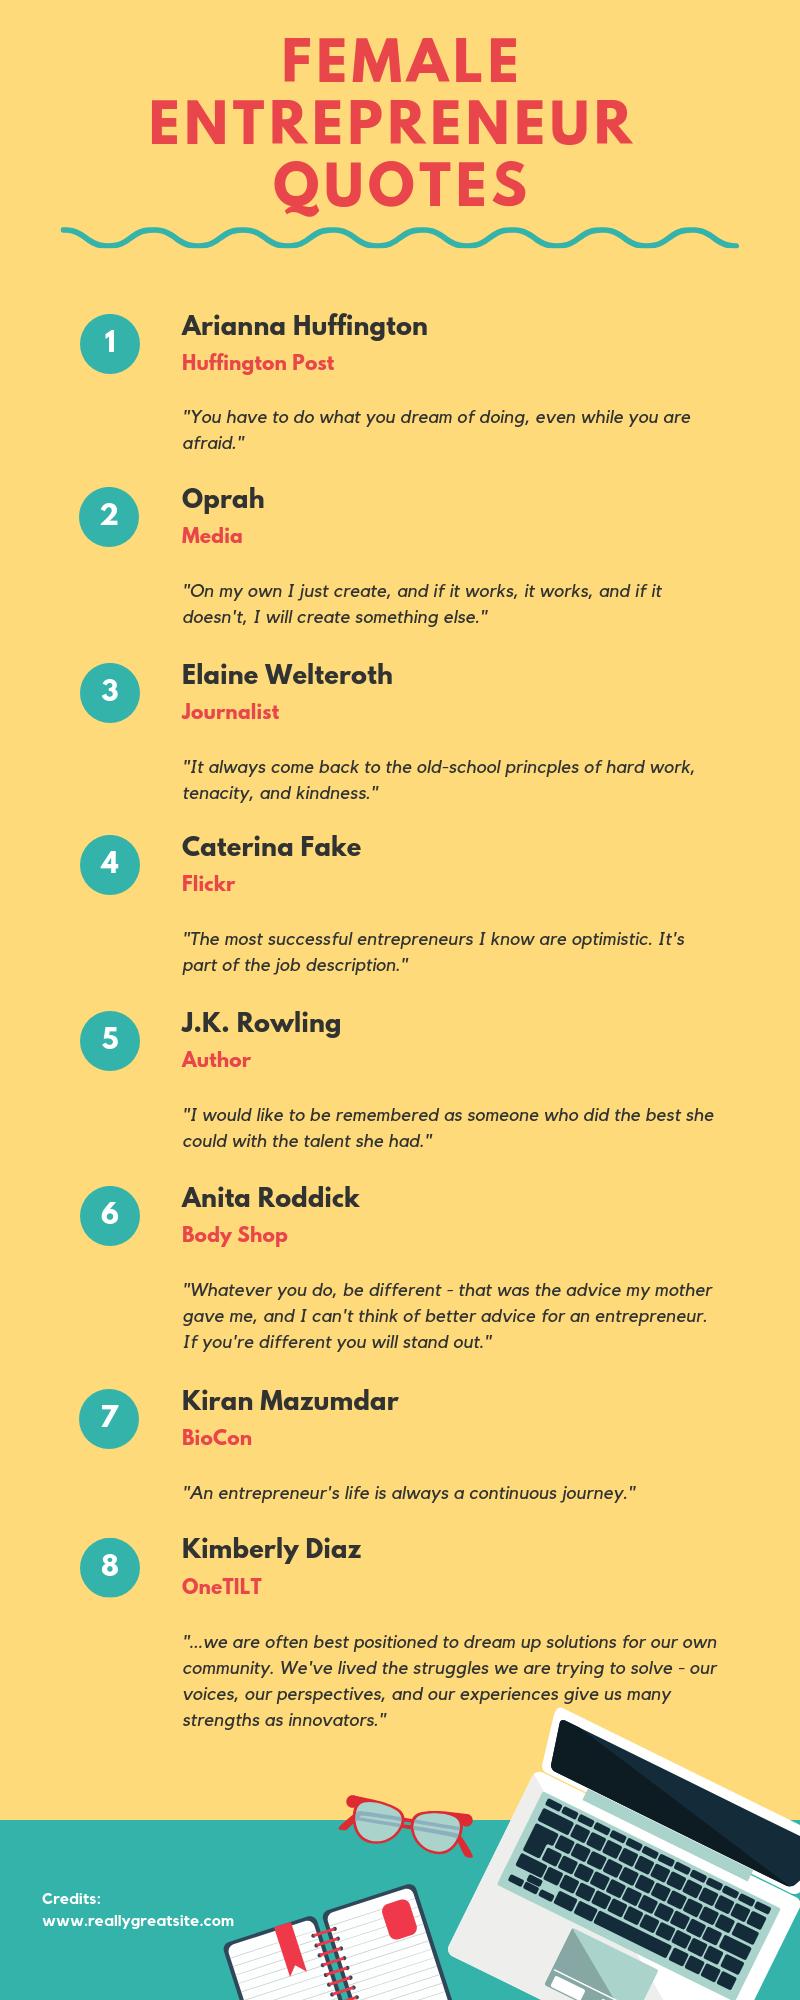 Female entrepreneur quotes.png